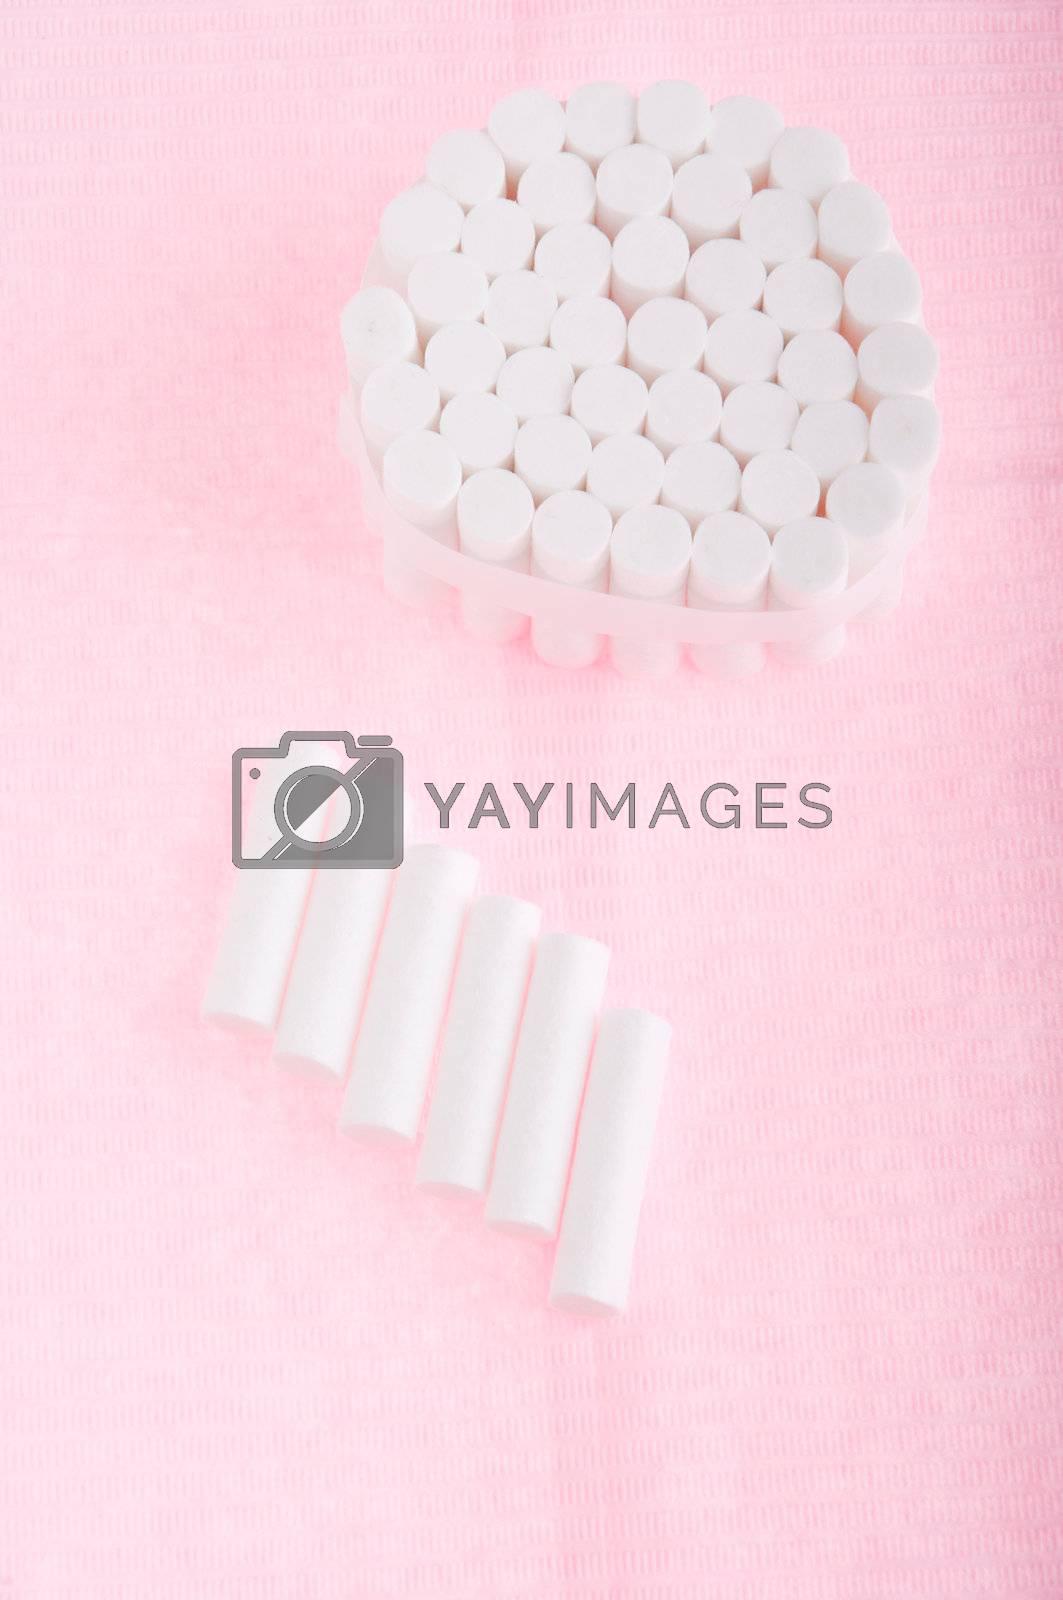 dental cotton rolls on a pink bib (dentistry equipment)